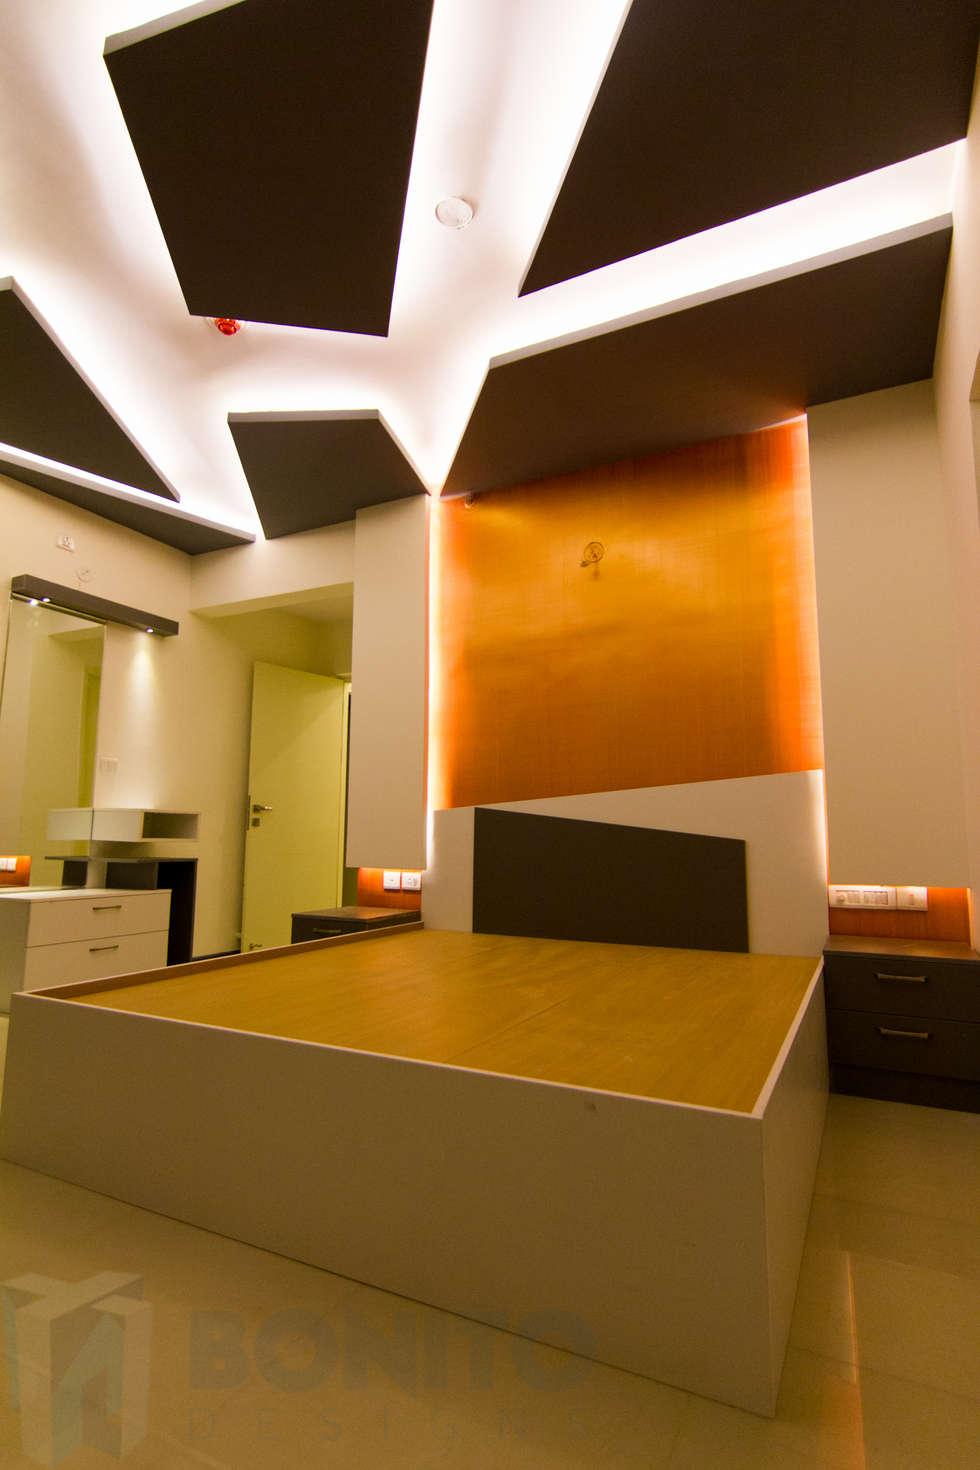 asian bedroom photos: bedroom design idea | homify